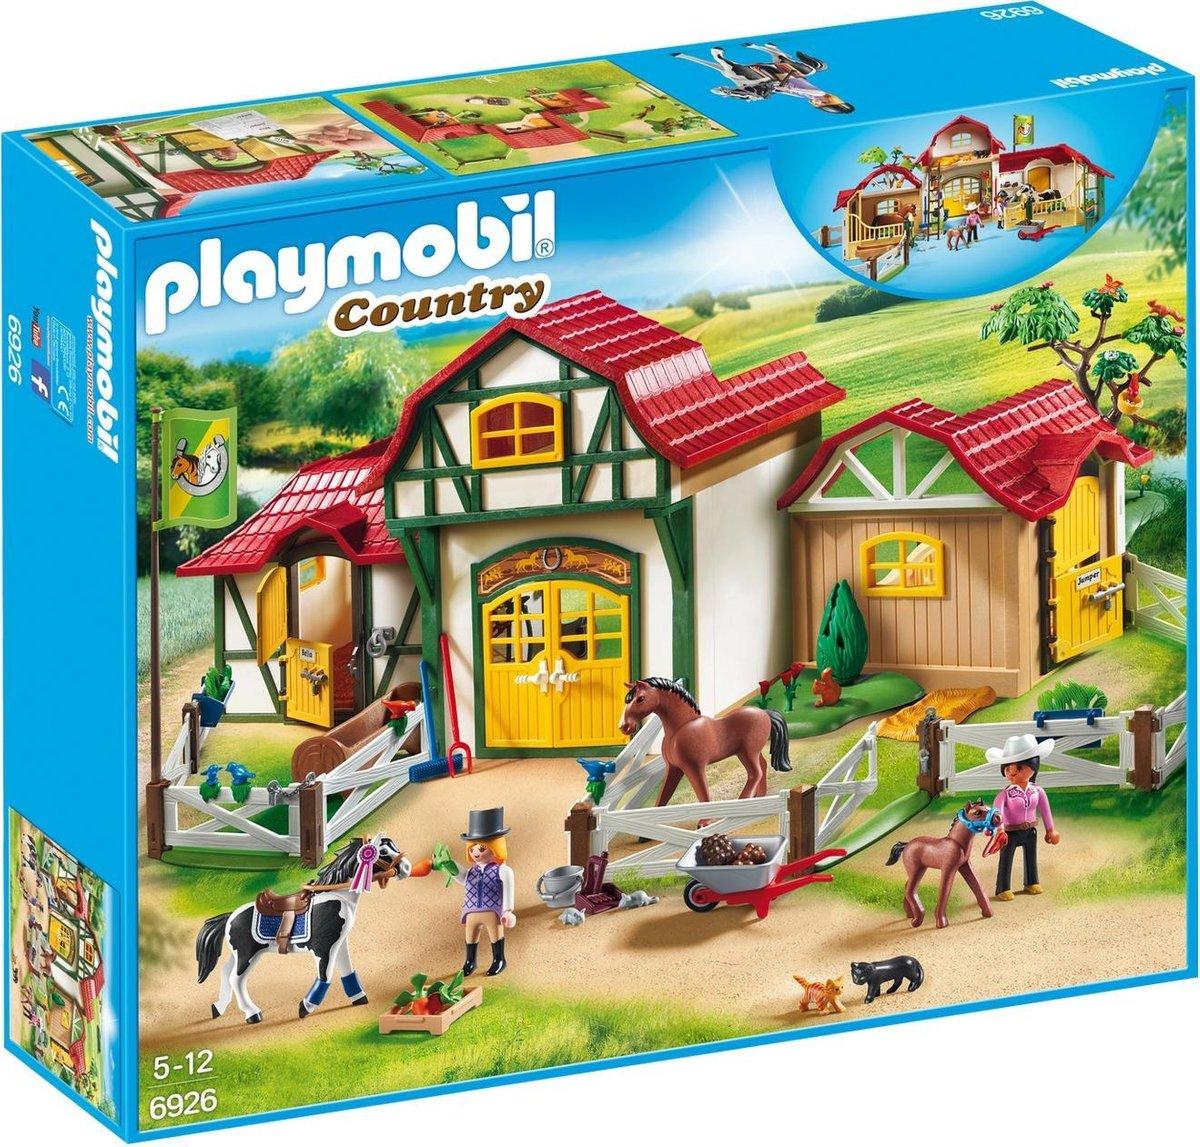 PLAYMOBIL Country Paardrijclub - 6926